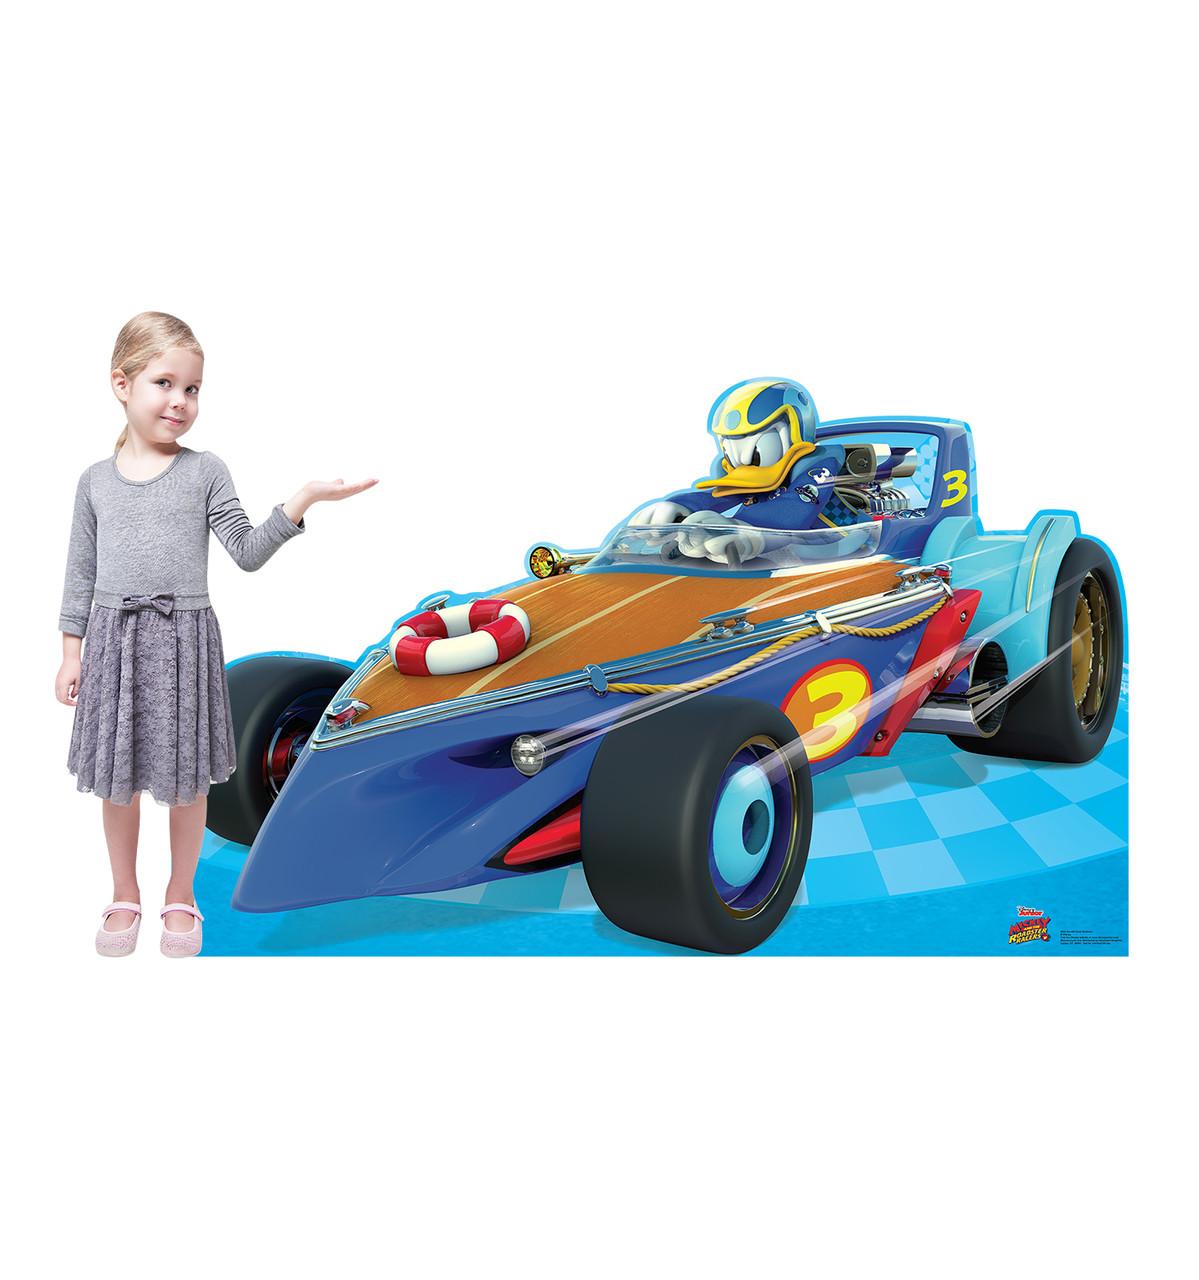 Life-size Donald Duck Roadster (Disney's Roadster Racers) Cardboard Standup 2